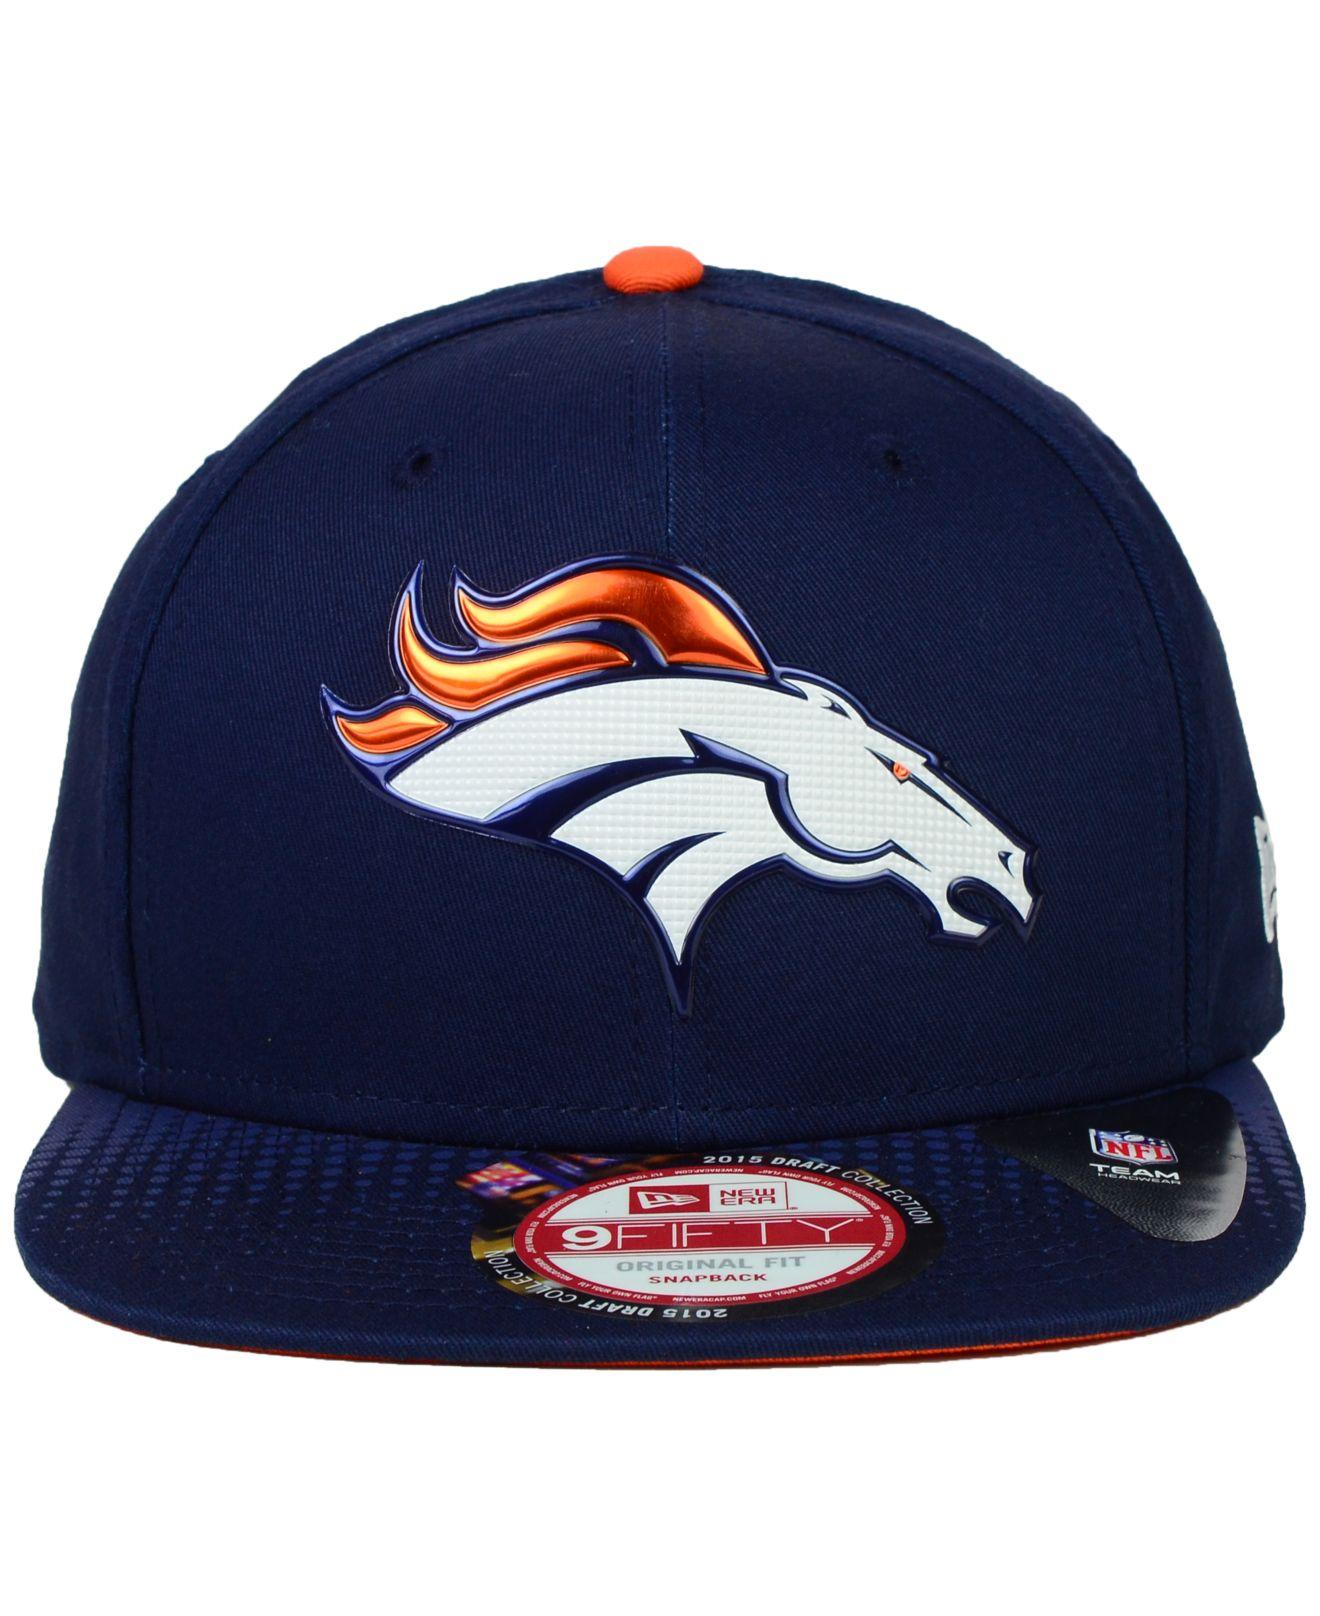 c16b4984d Lyst - KTZ Denver Broncos 2015 Nfl Draft 9fifty Snapback Cap in Blue ...